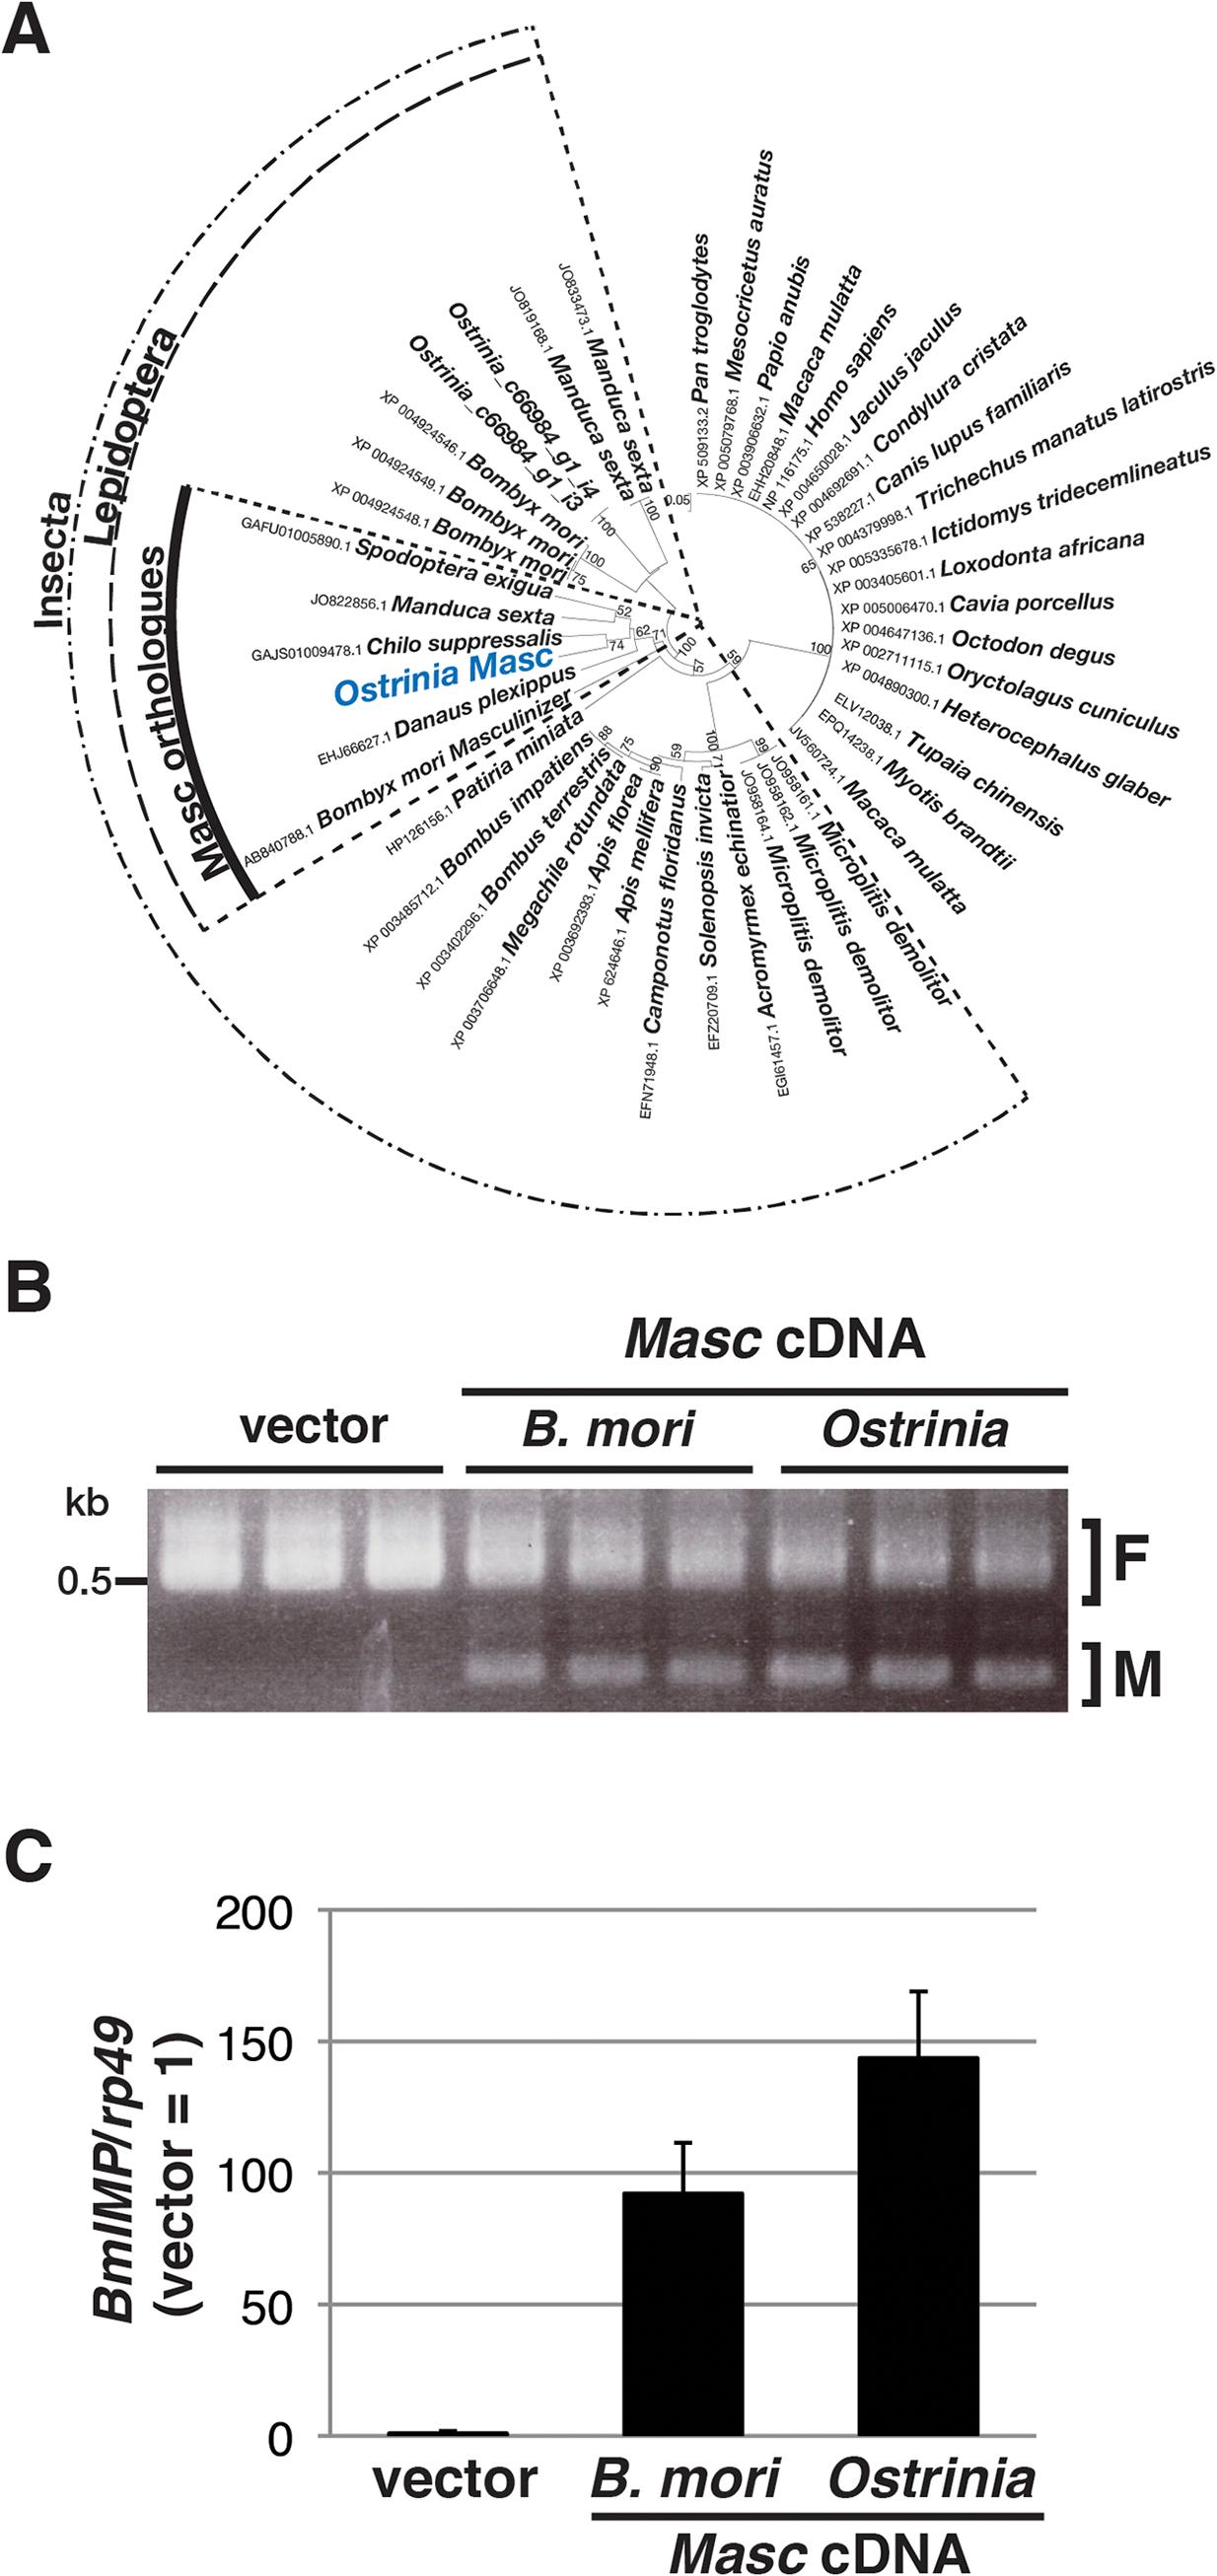 Identification and characterization of <i>Ostrinia</i> Masc protein.